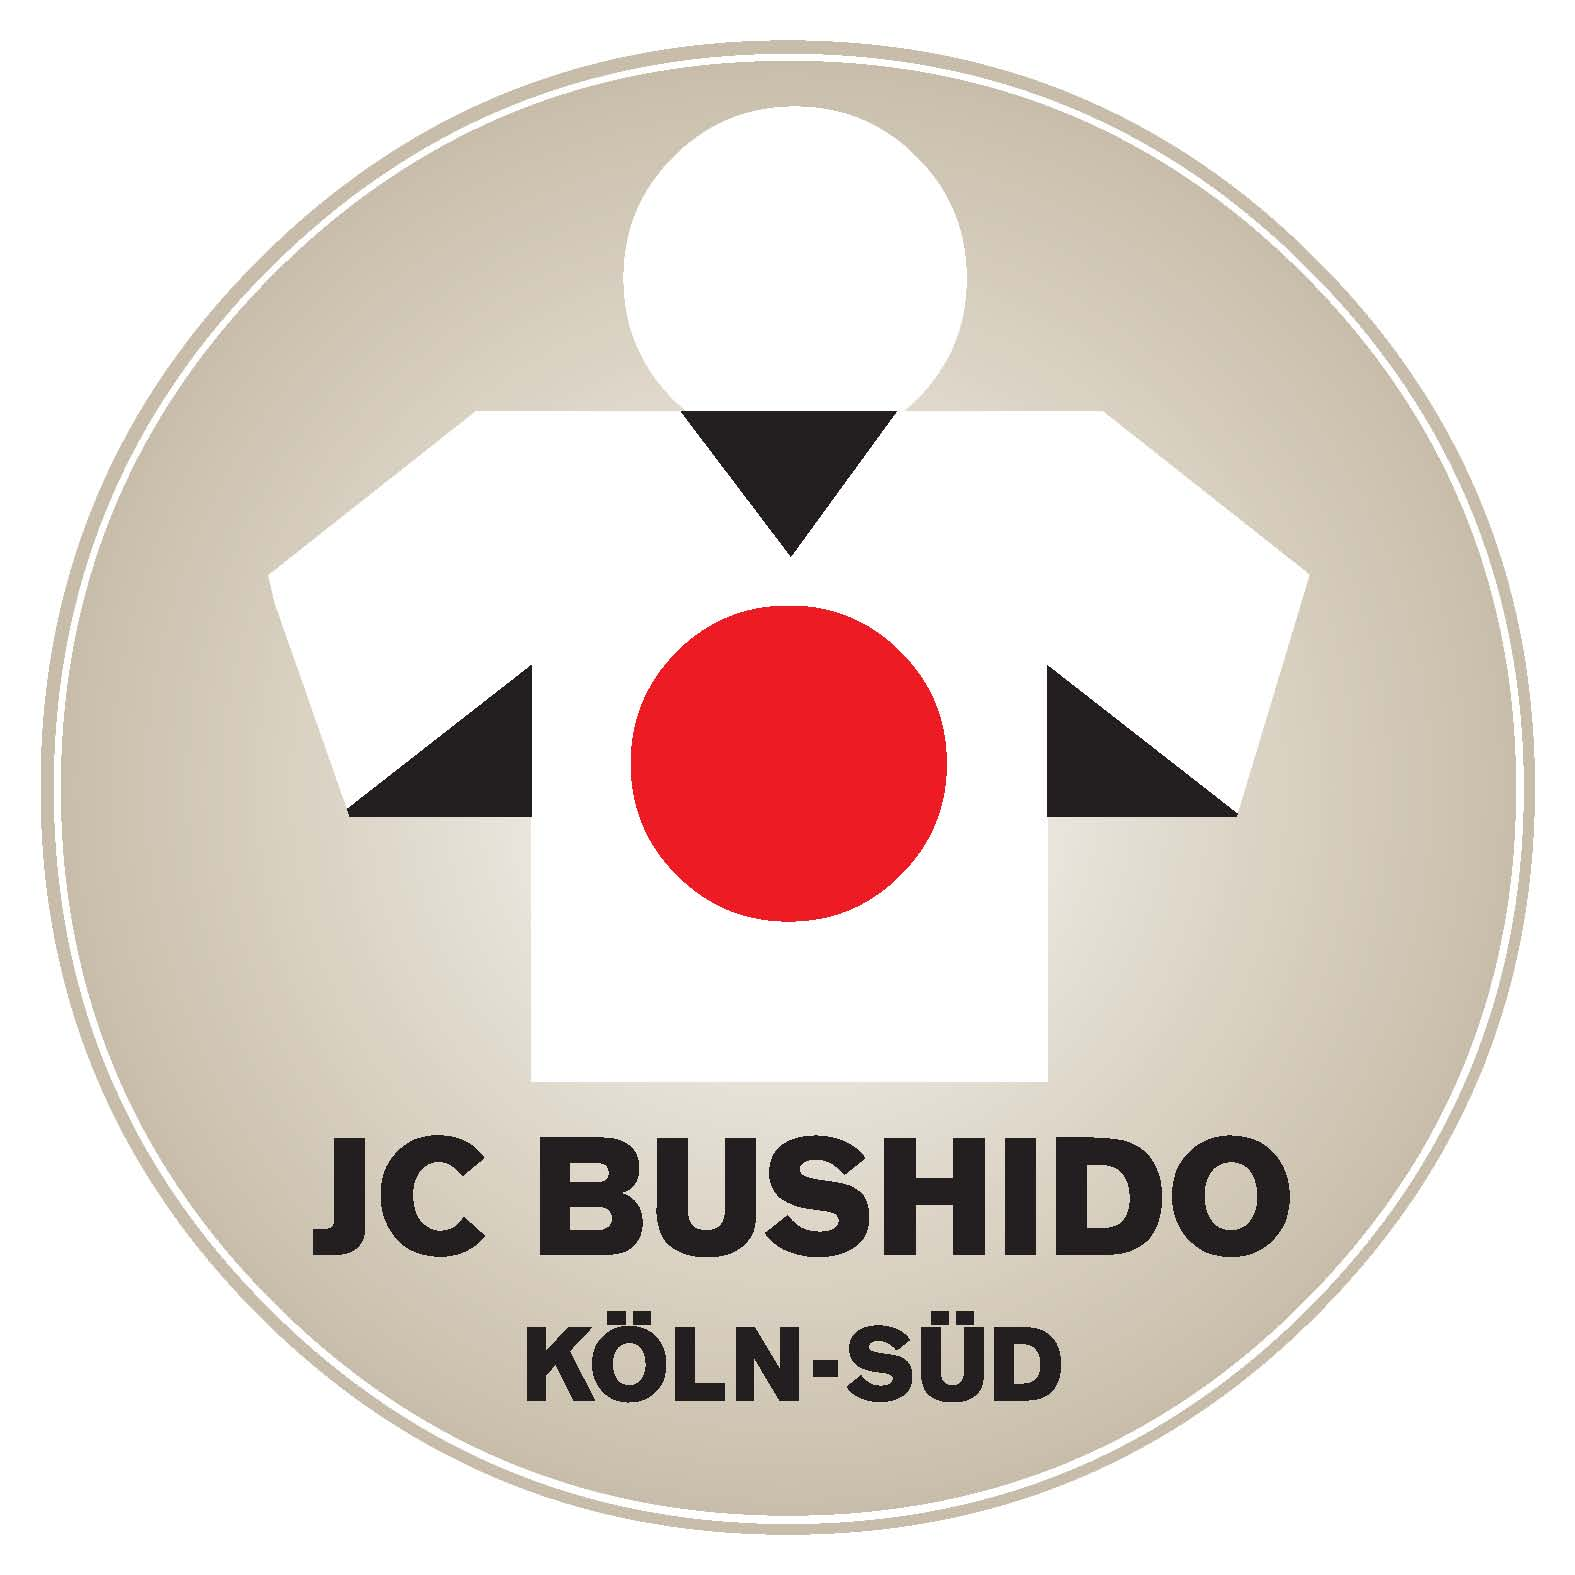 Bushido Köln